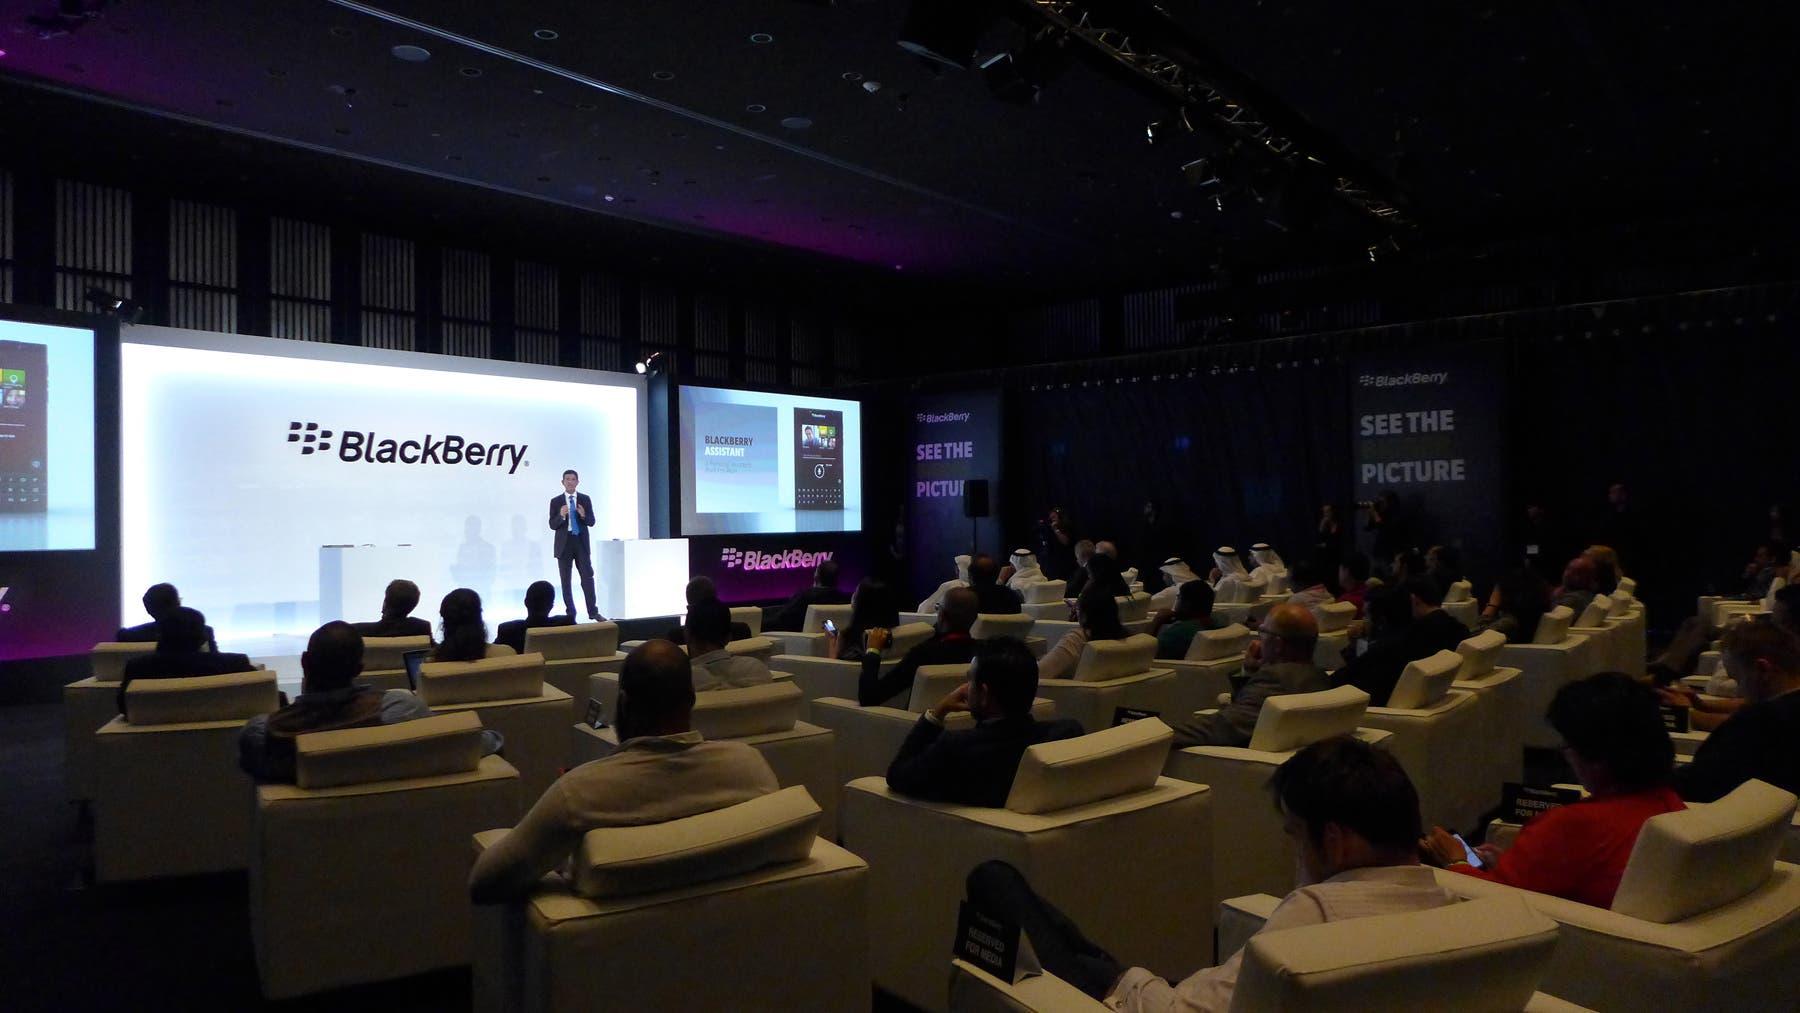 Al Arabiya News launches new app for BlackBerry 10 smartphones